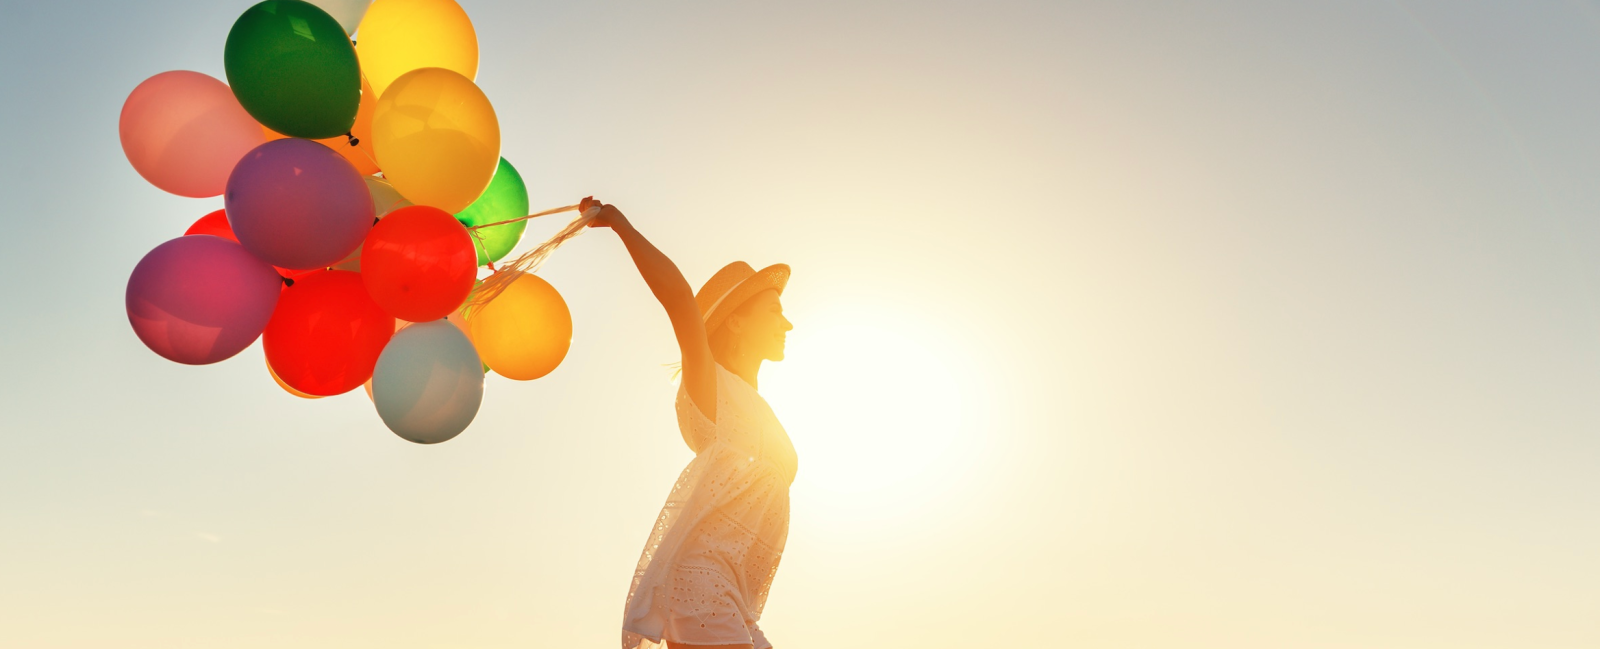 Balloon, happiness, happy